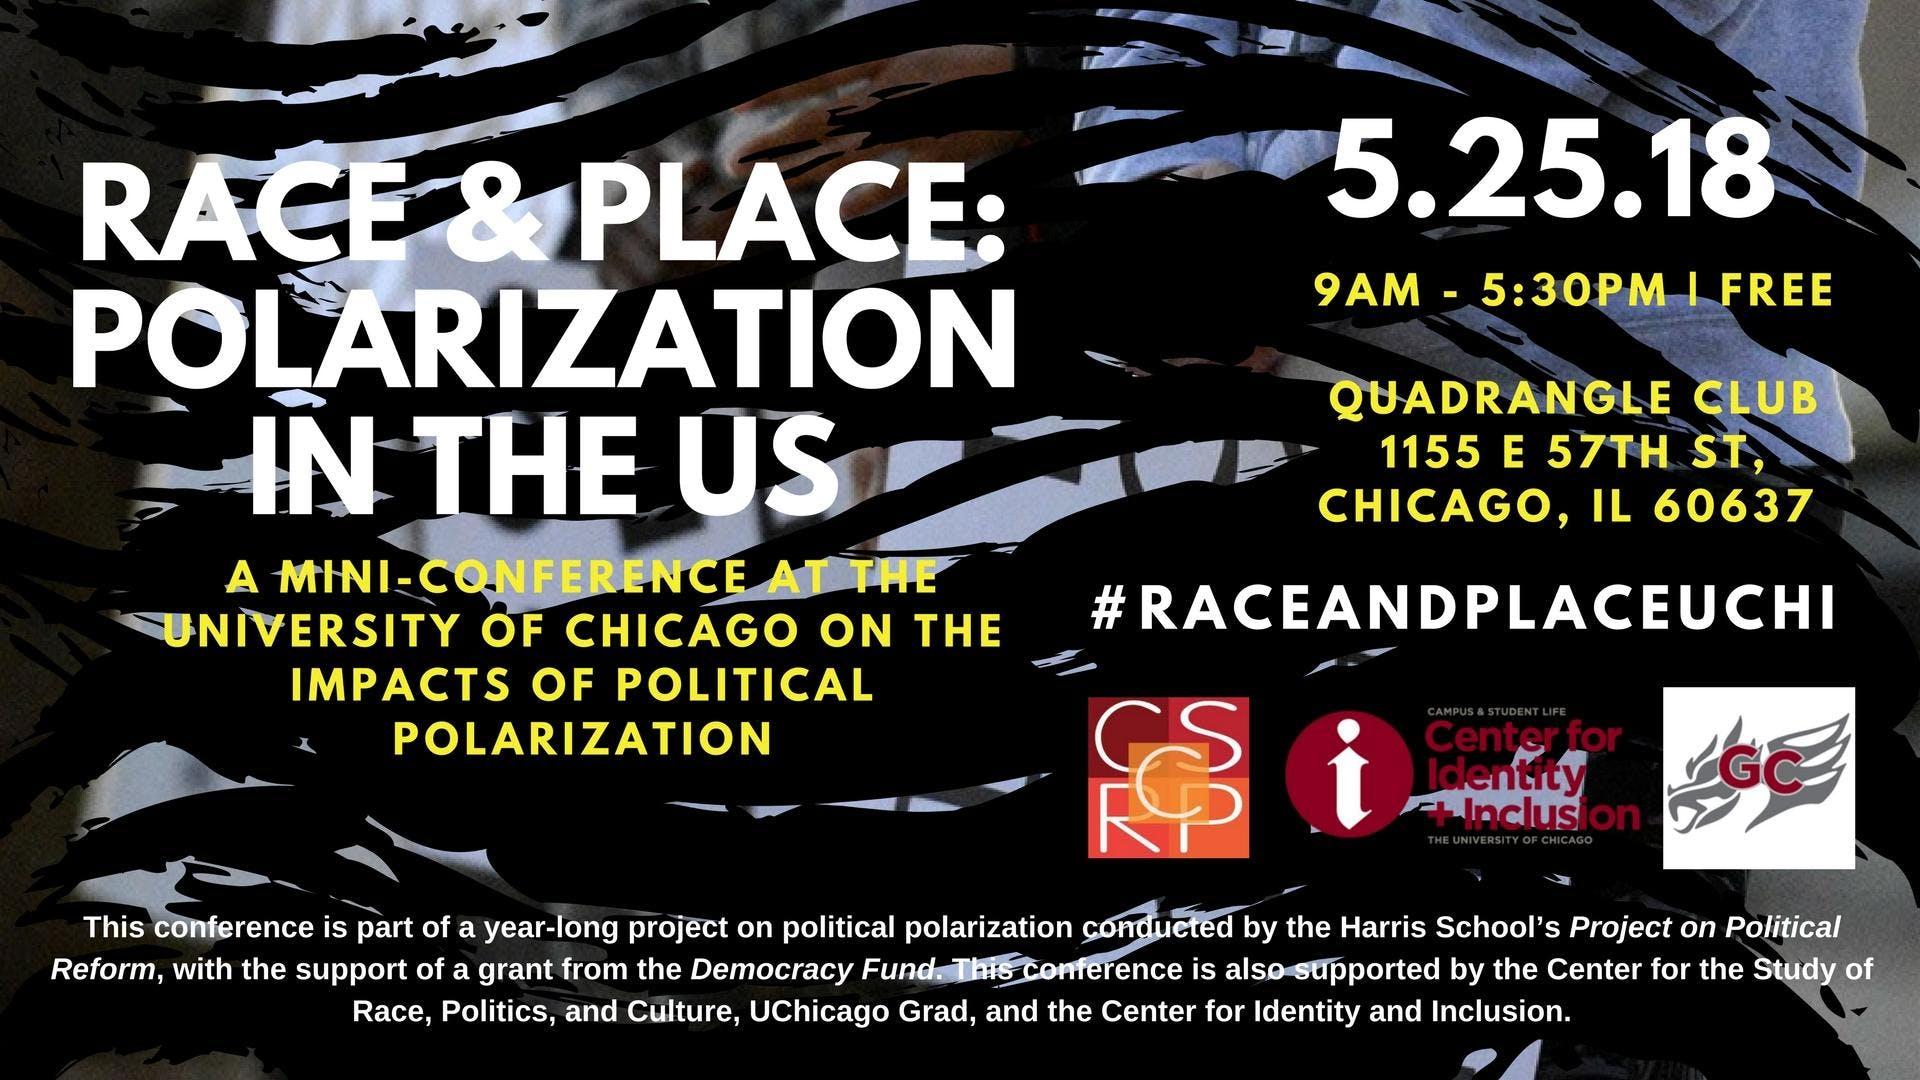 Mini-conference on Race and Place: Polarizati